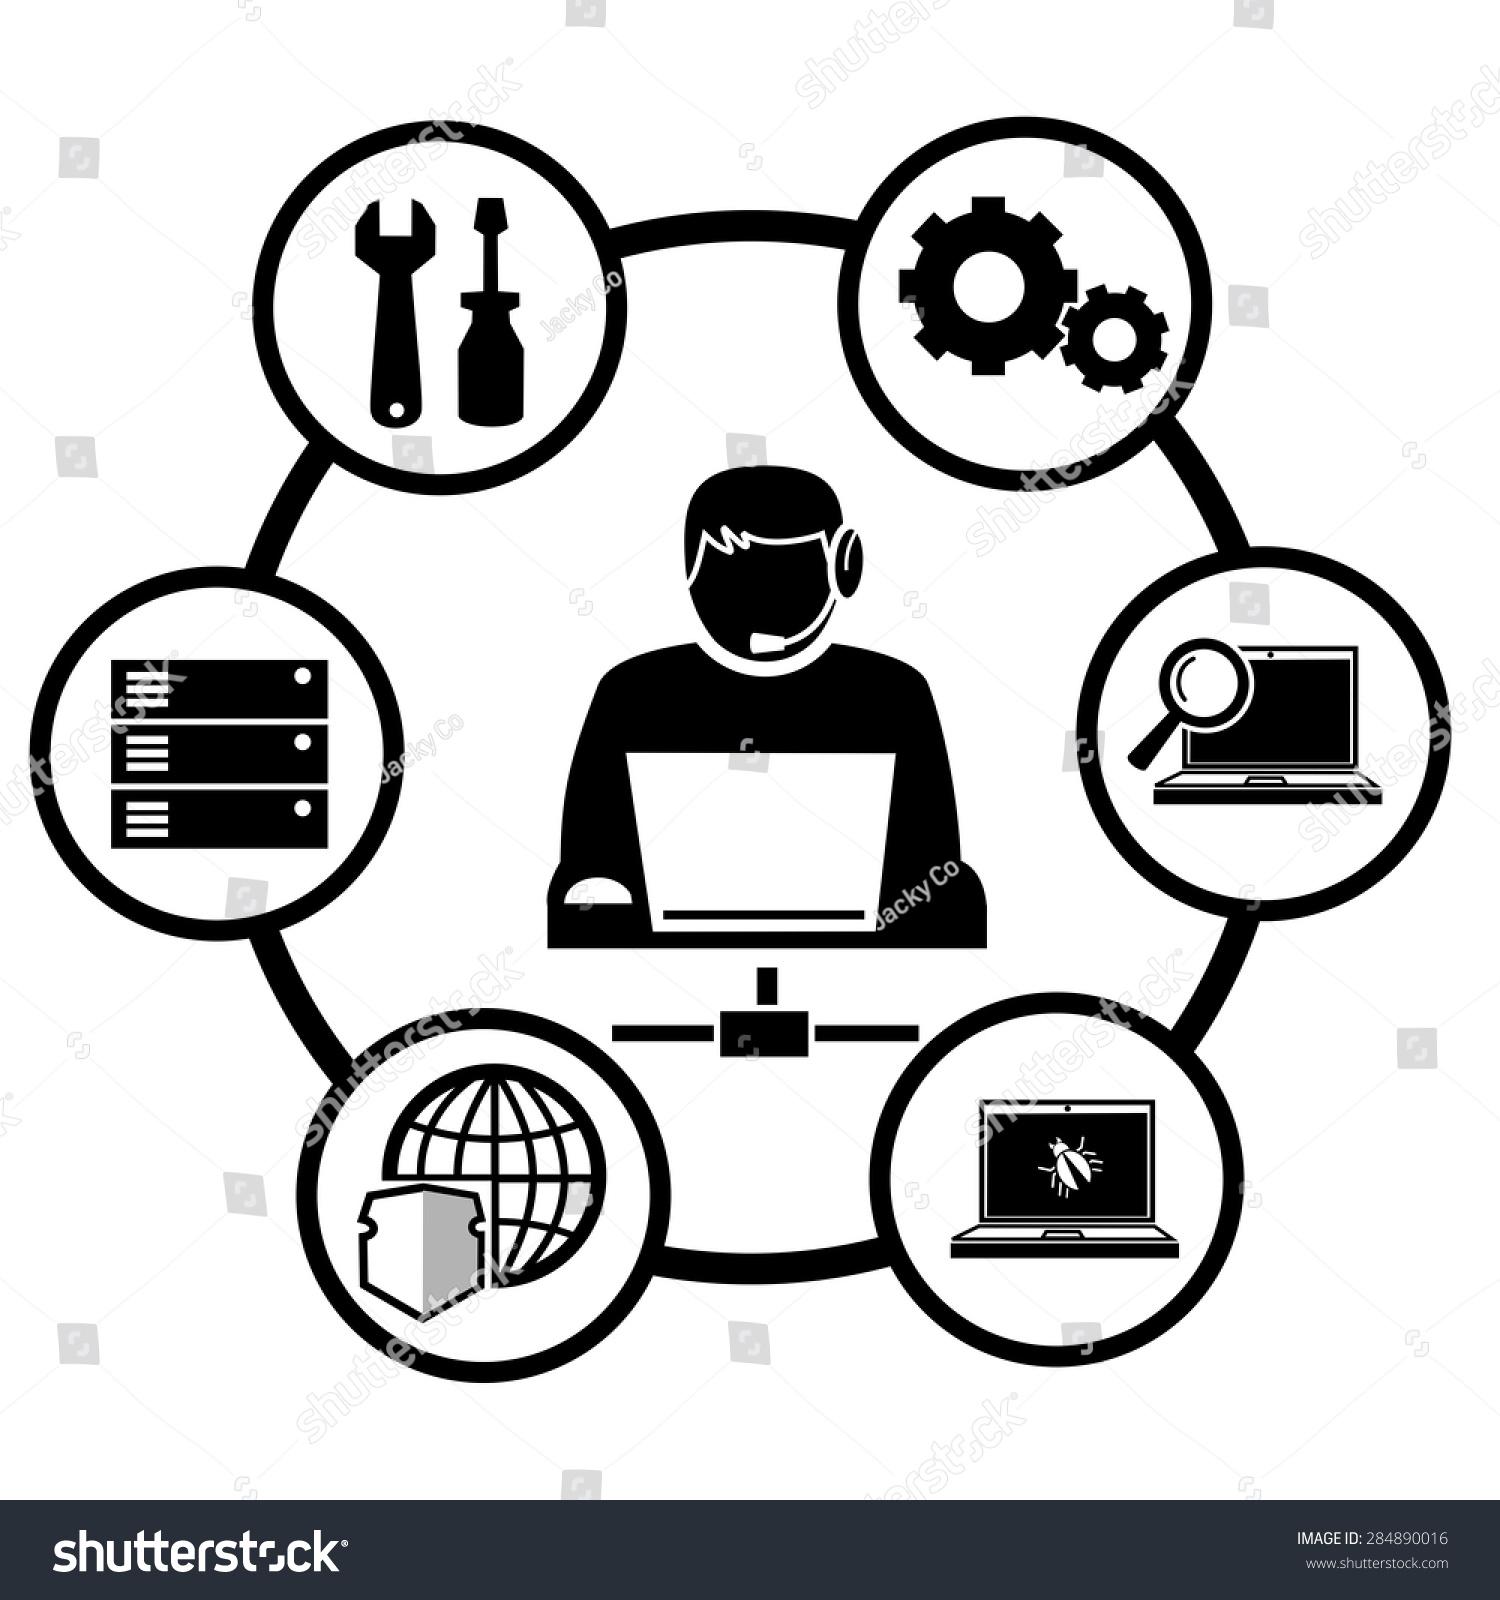 Computer Technician Icons Vector Stock Vector 284890016 - Shutterstock